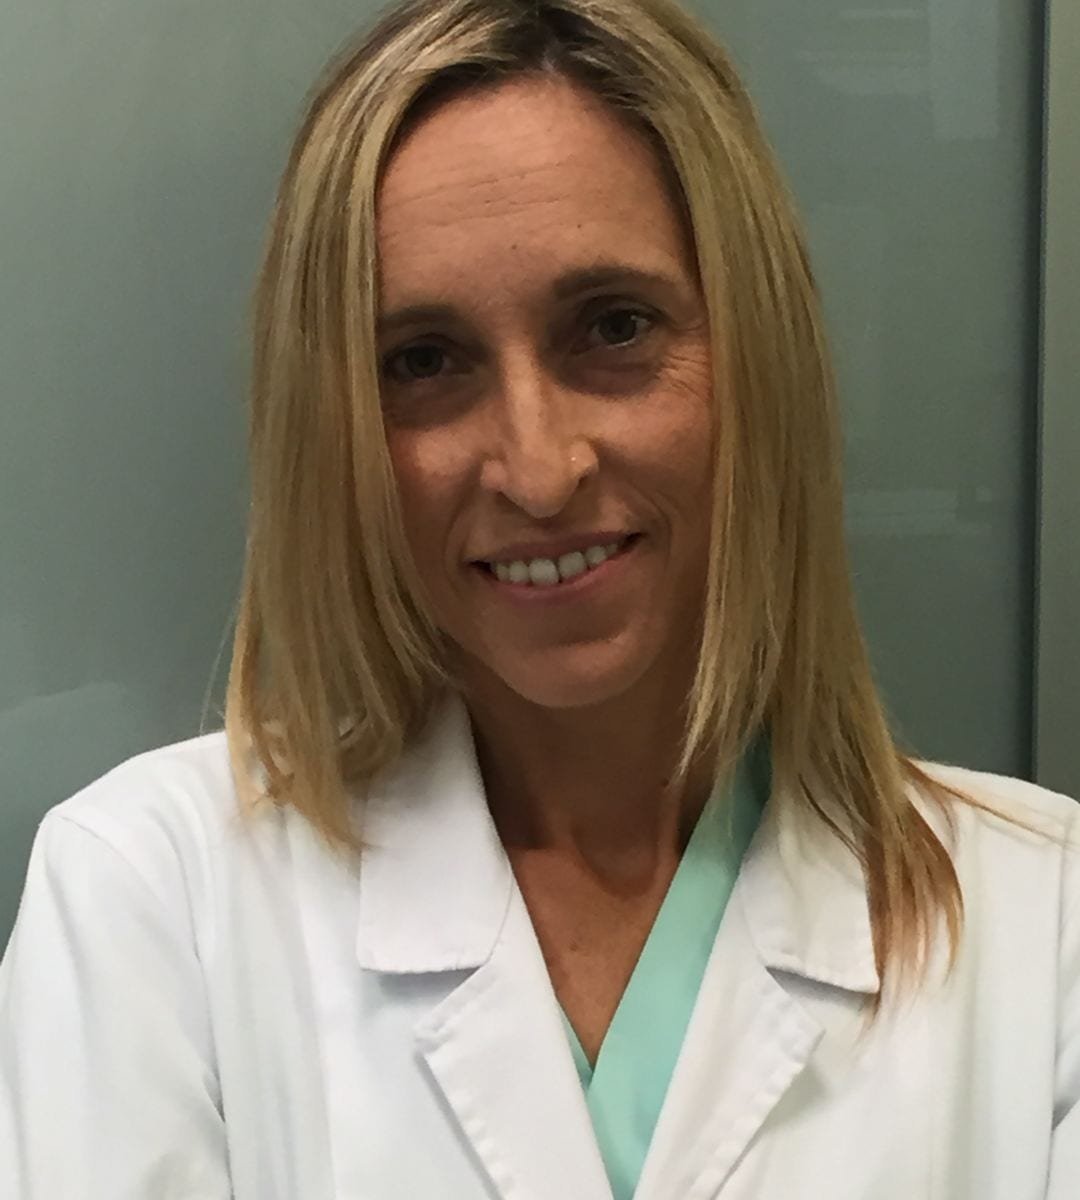 Nicoletta Tarozzi